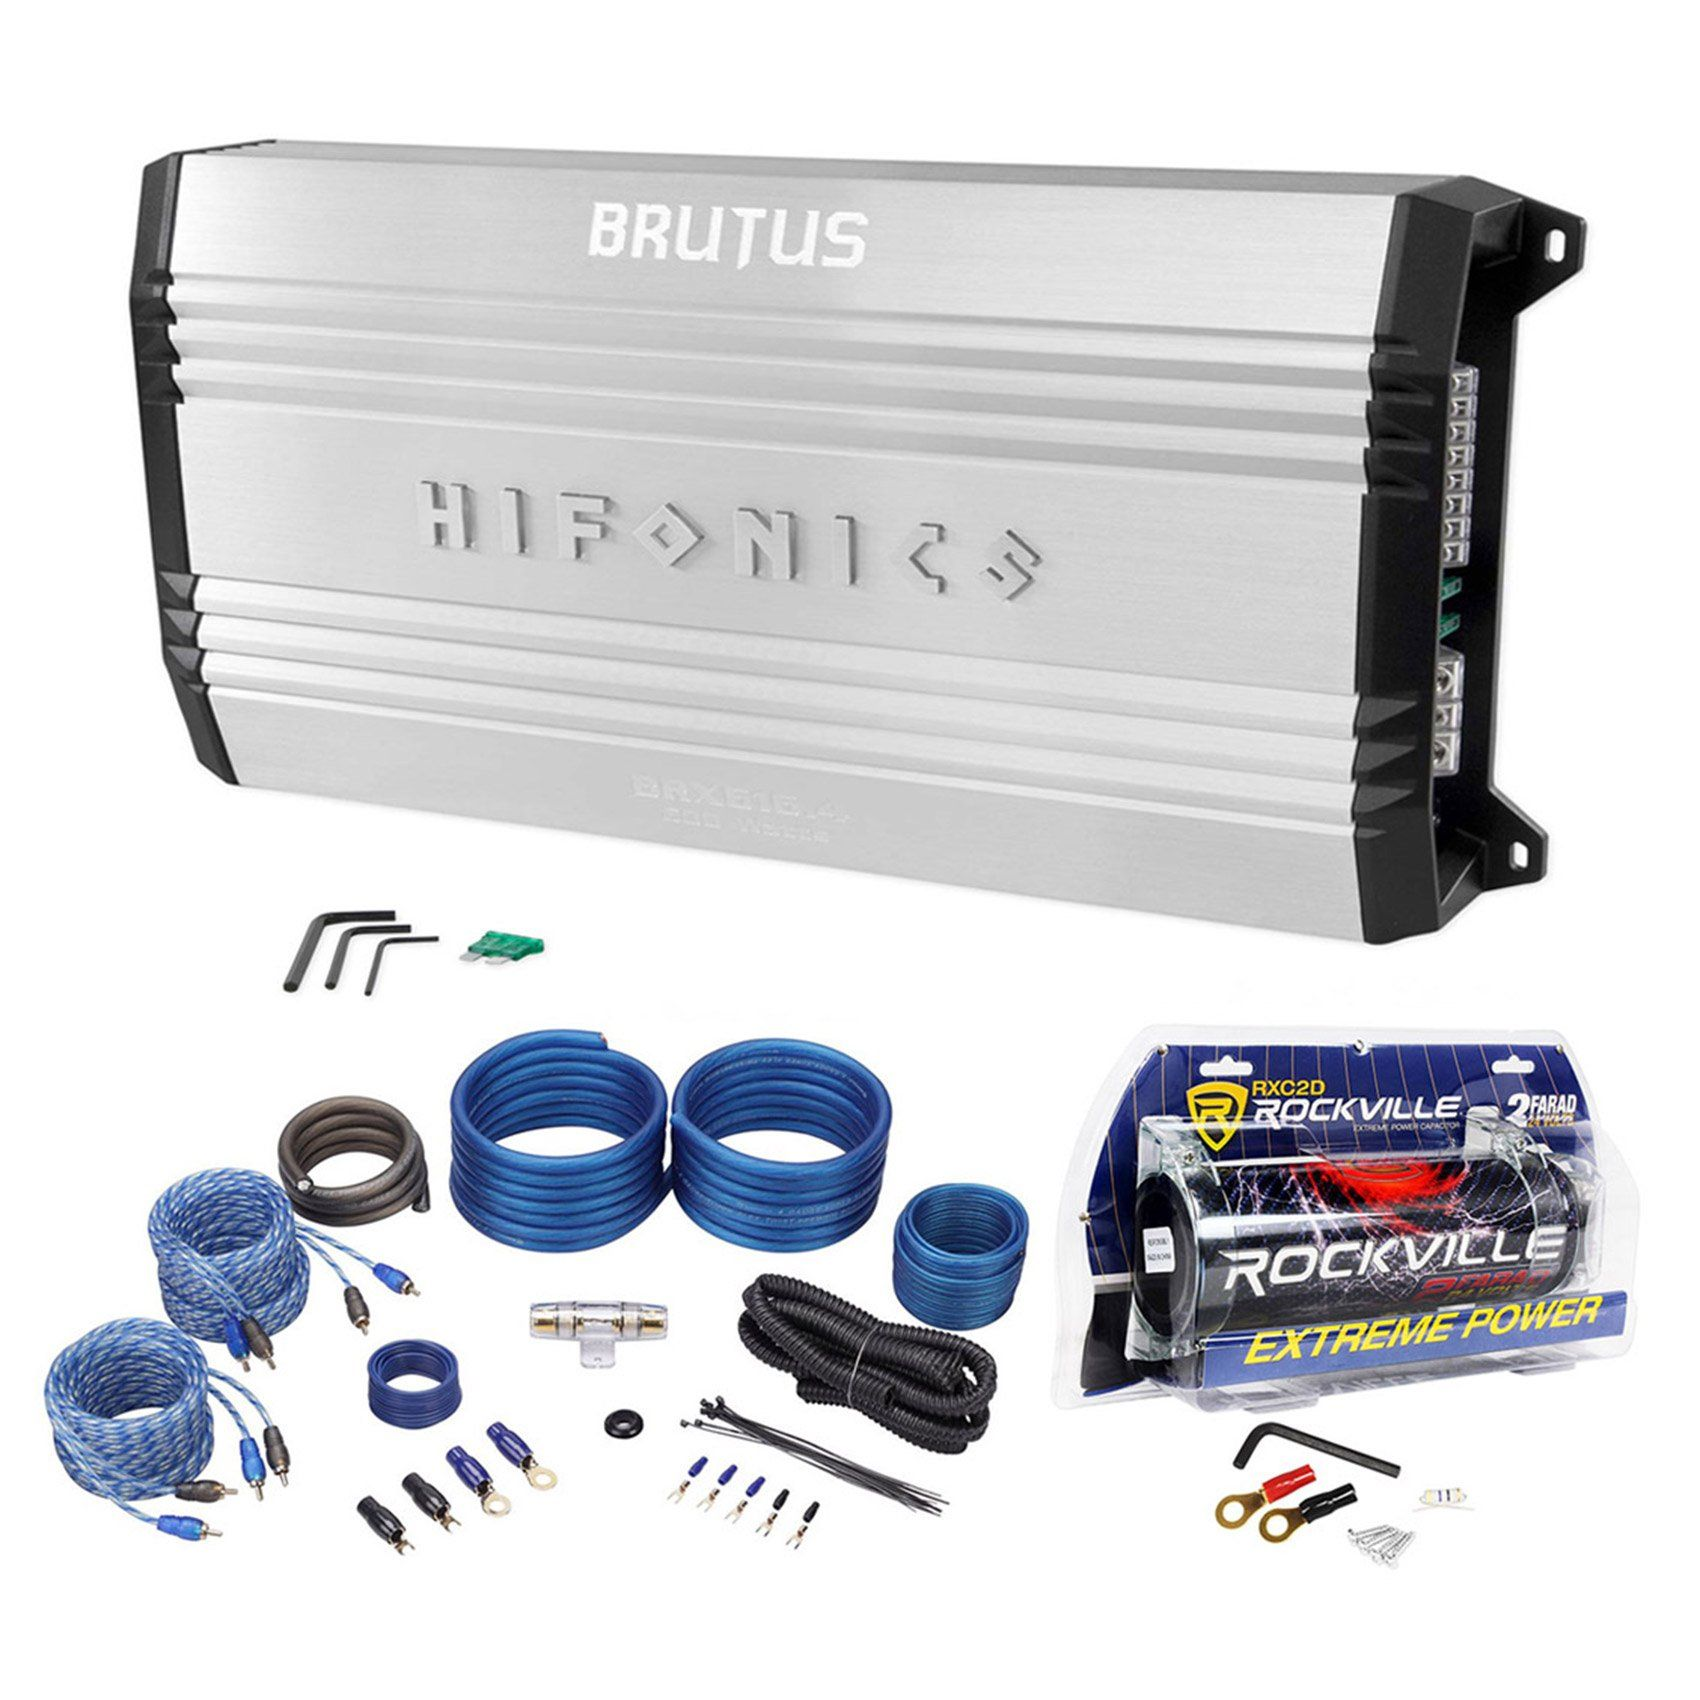 Package: Hifonics Brutus BRX616.4 600 Watt RMS 4 Channel Amplifier ...